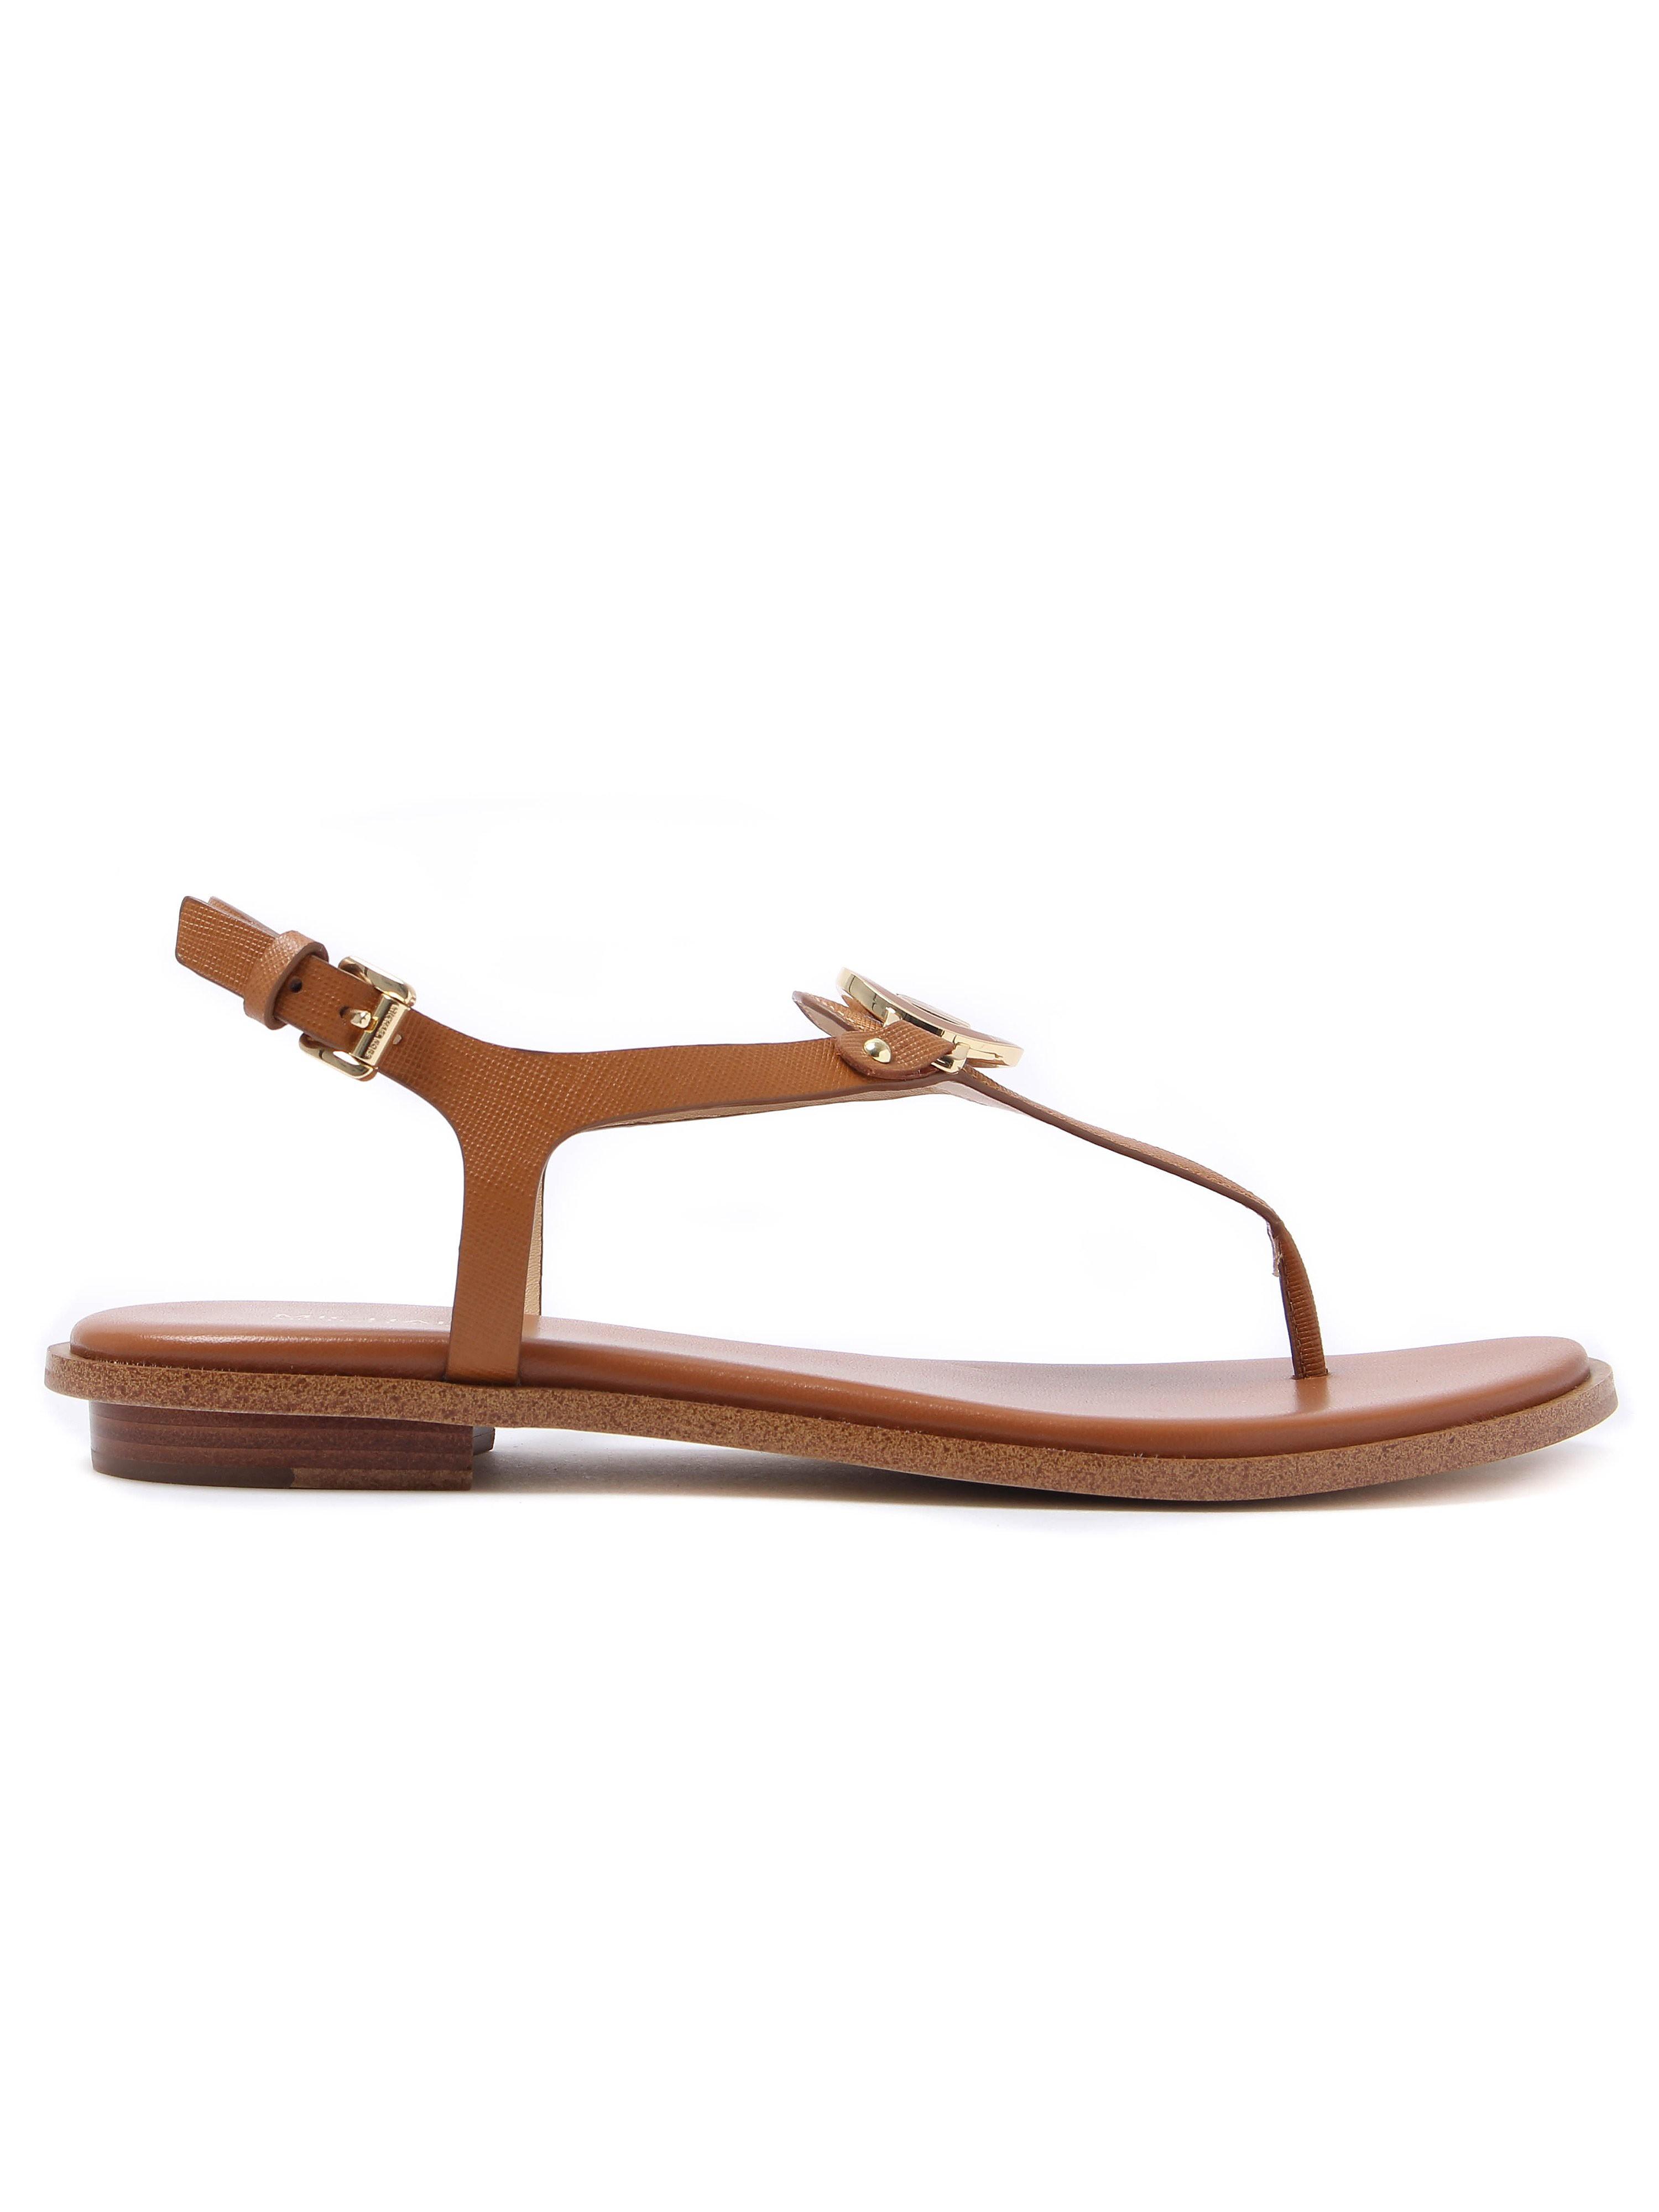 MICHAEL Michael Kors Women's Lee Thong Leather Sandals - Acorn